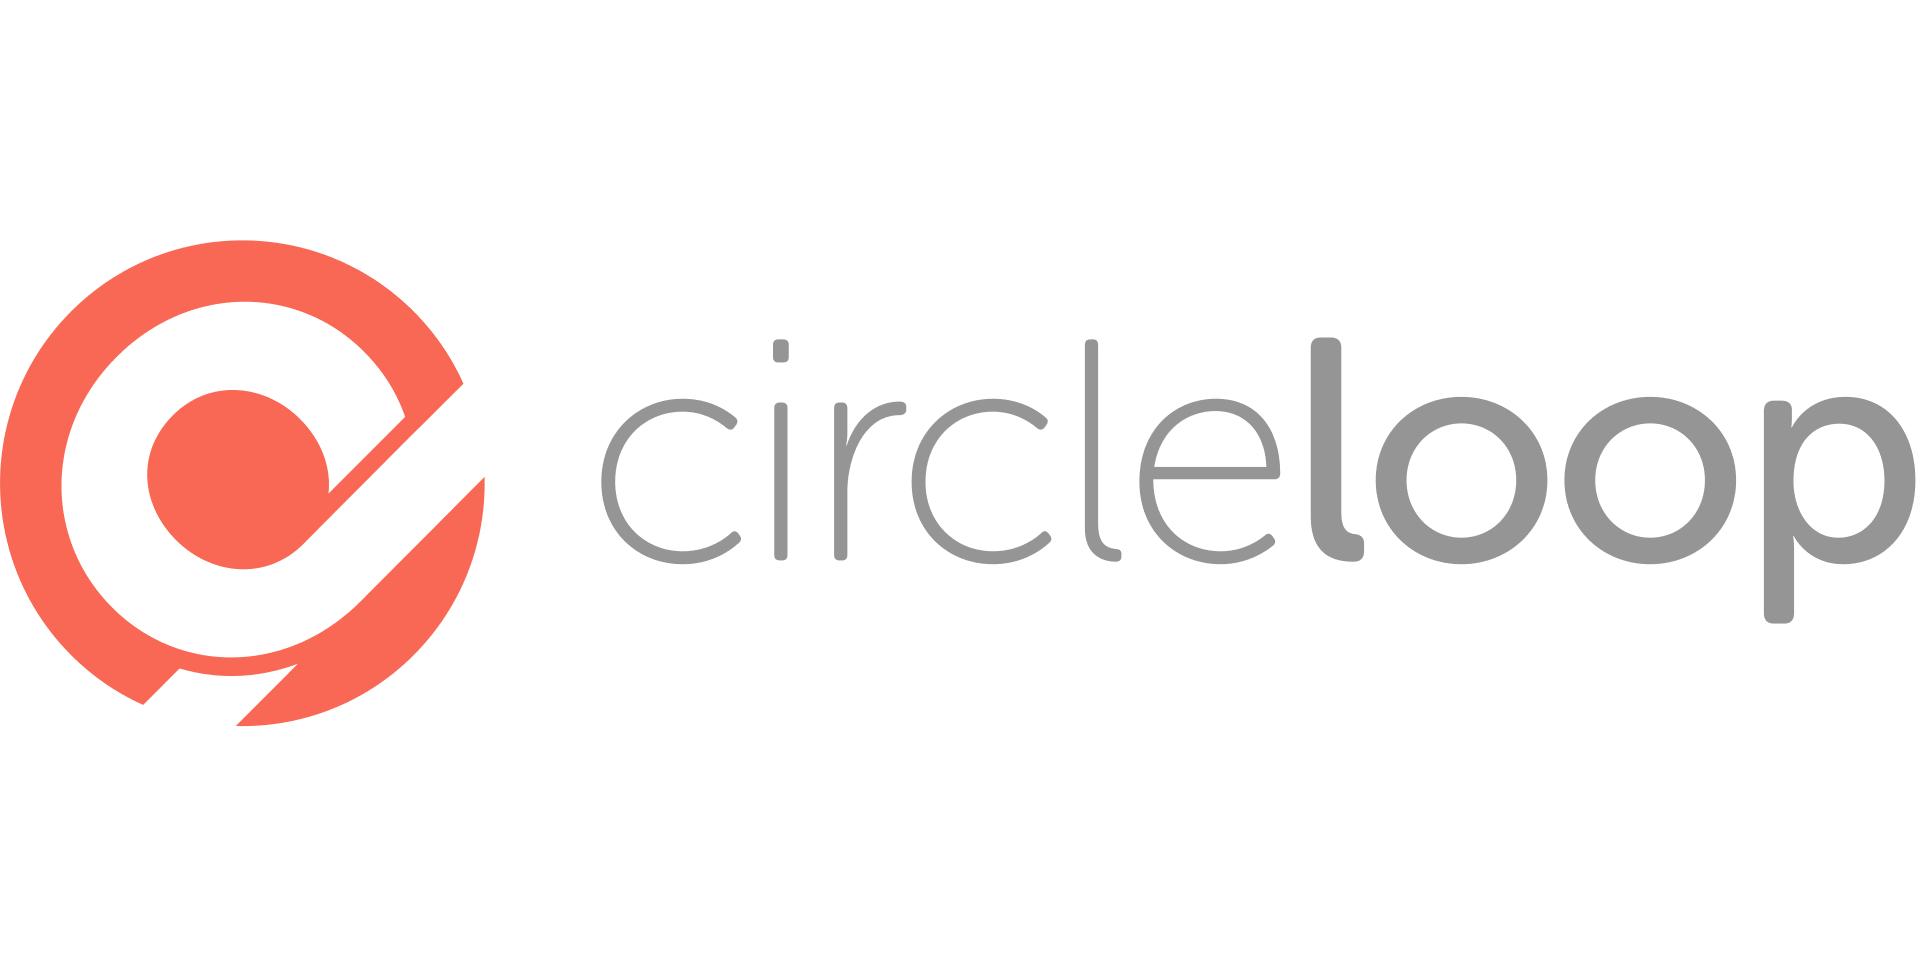 Circlelooop